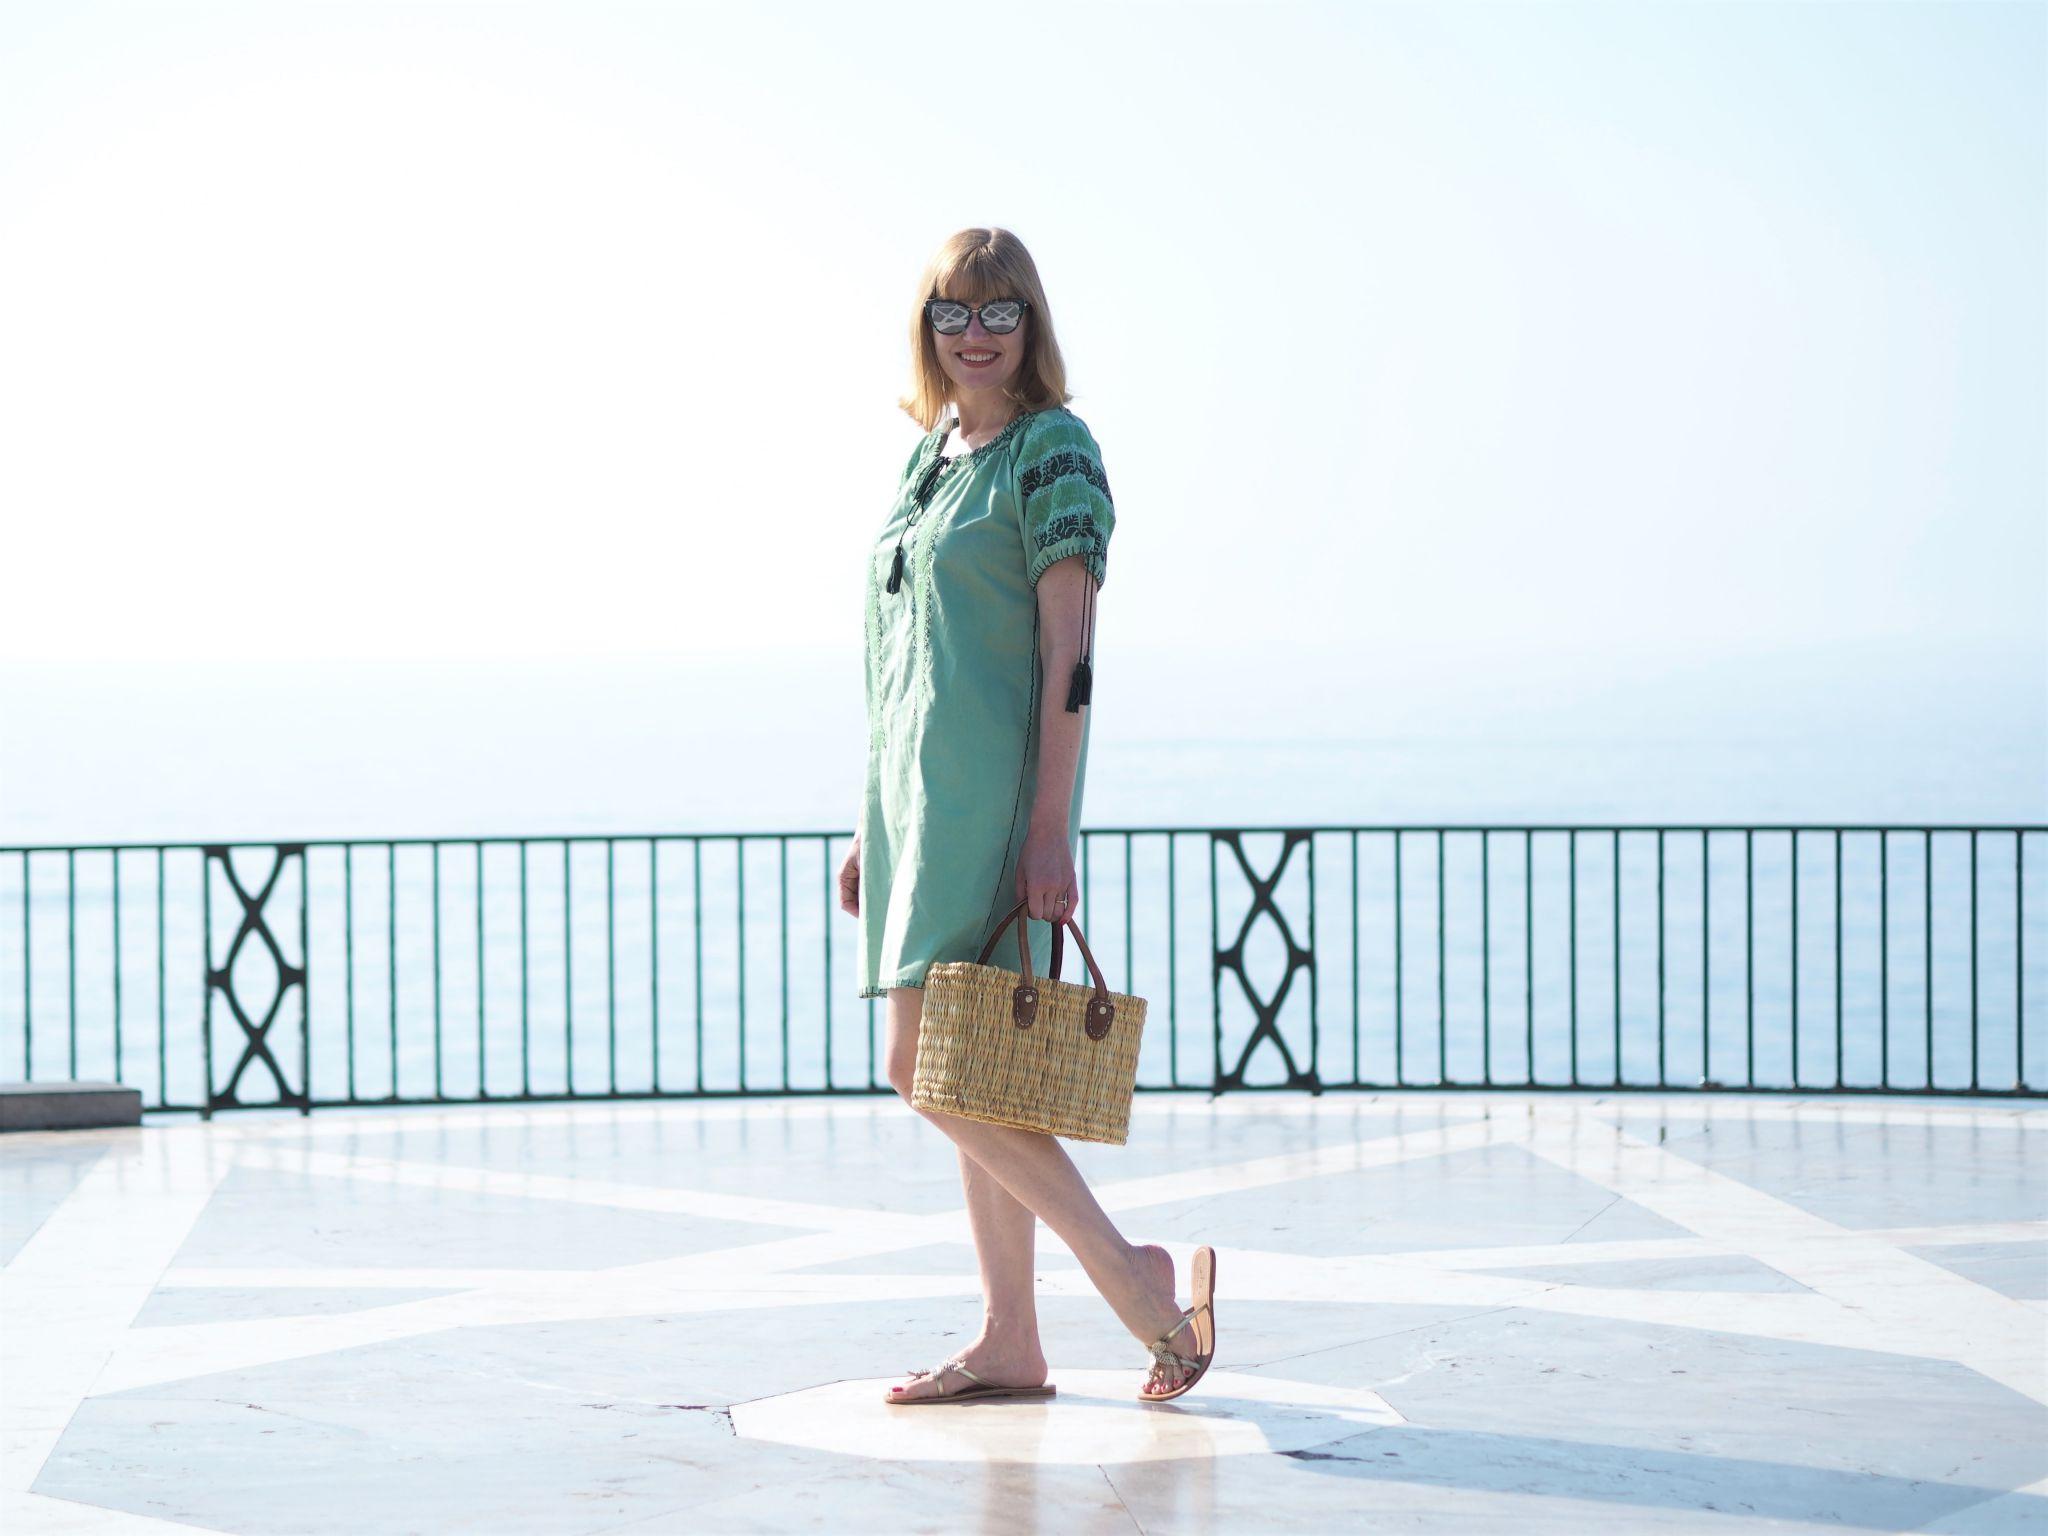 Green embroidered beach dress and green cat eye sunglasses el Balcon de Europa